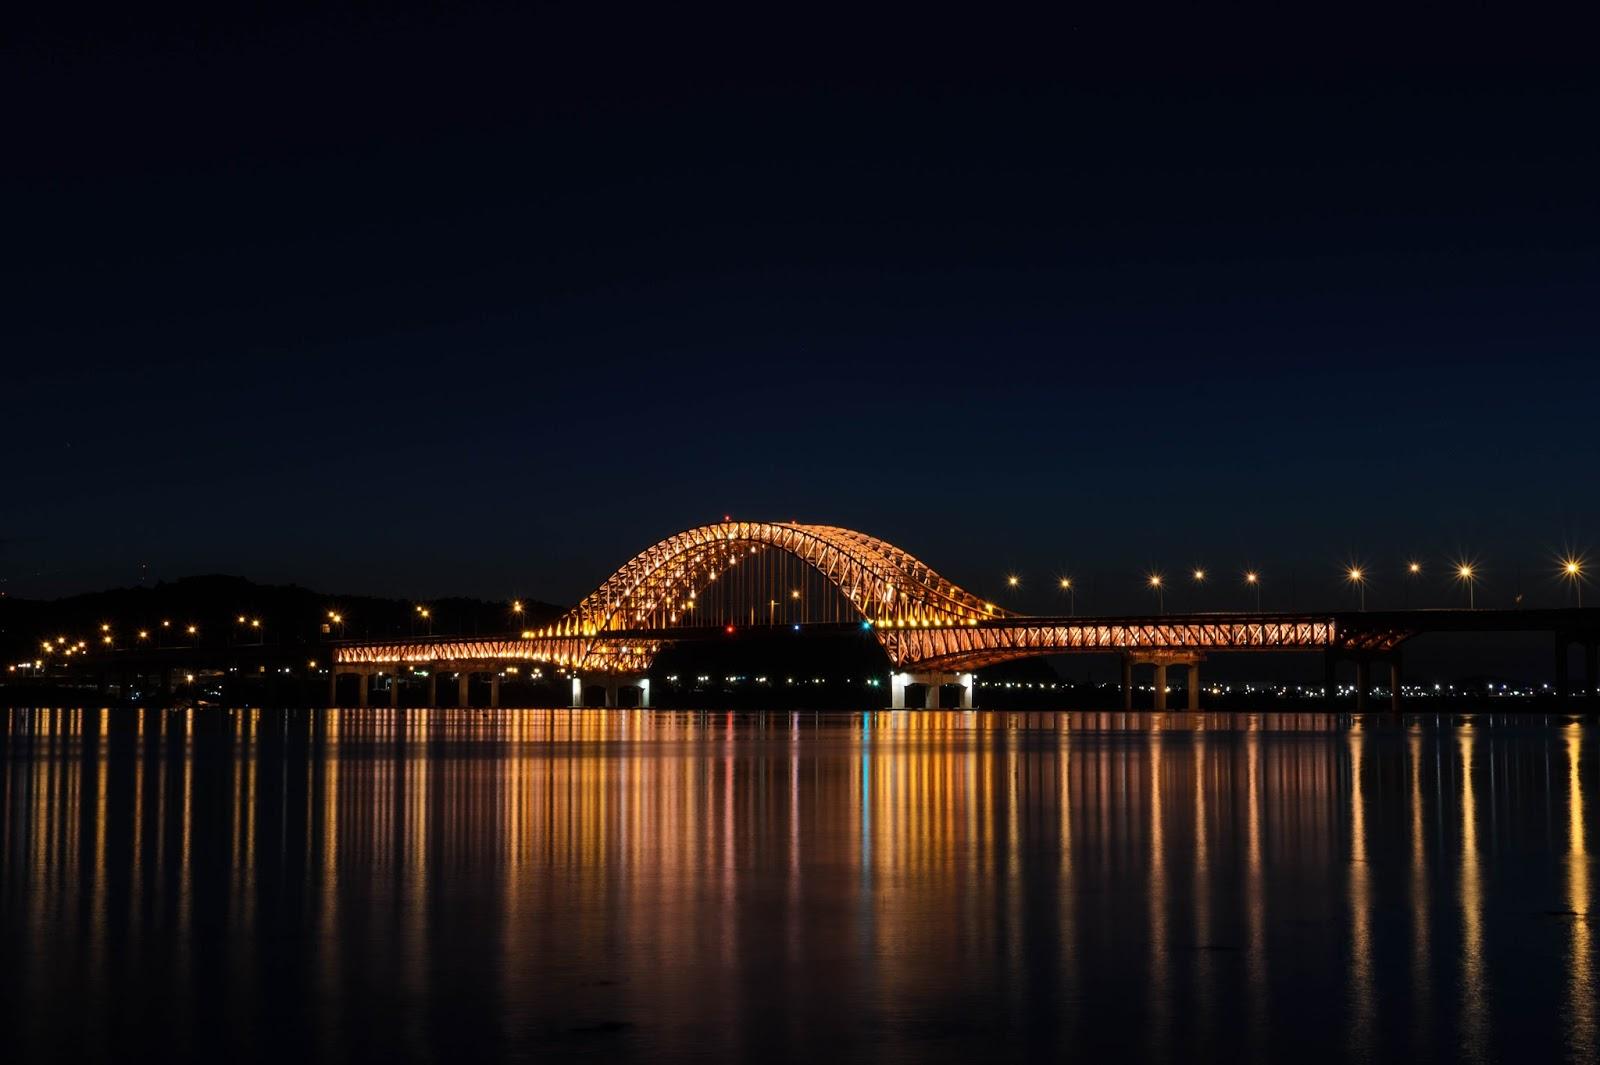 Seoul bridges